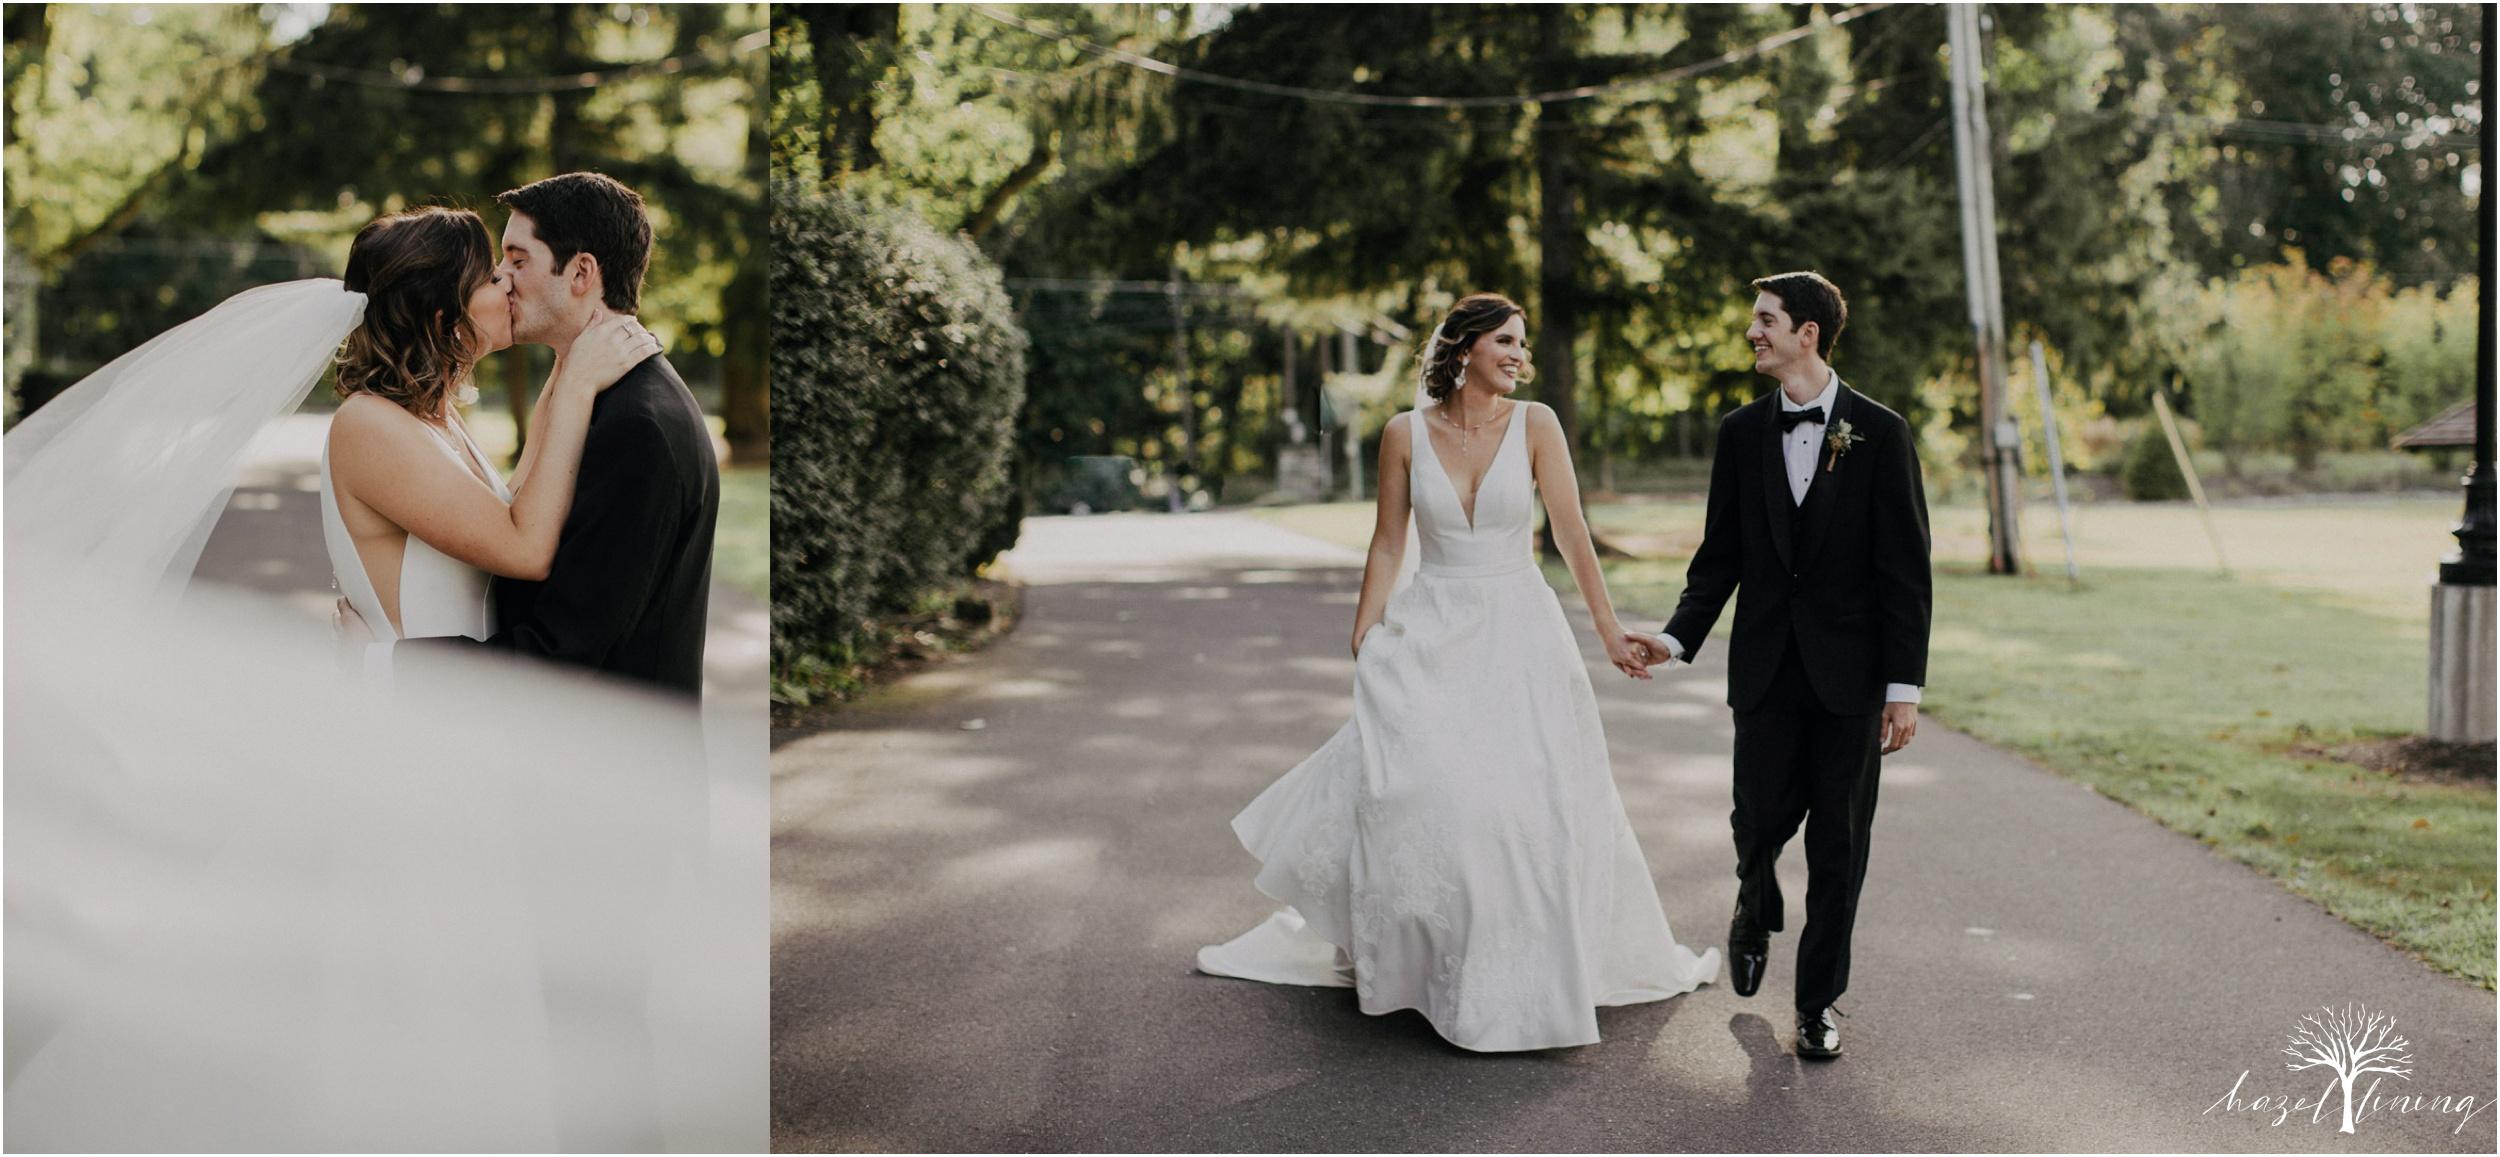 maureen-hepner-anthony-giordano-rose-bank-winery-newtow-pennsylvania-luxury-summer-wedding-hazel-lining-photography-destination-elopement-wedding-engagement-photography_0096.jpg